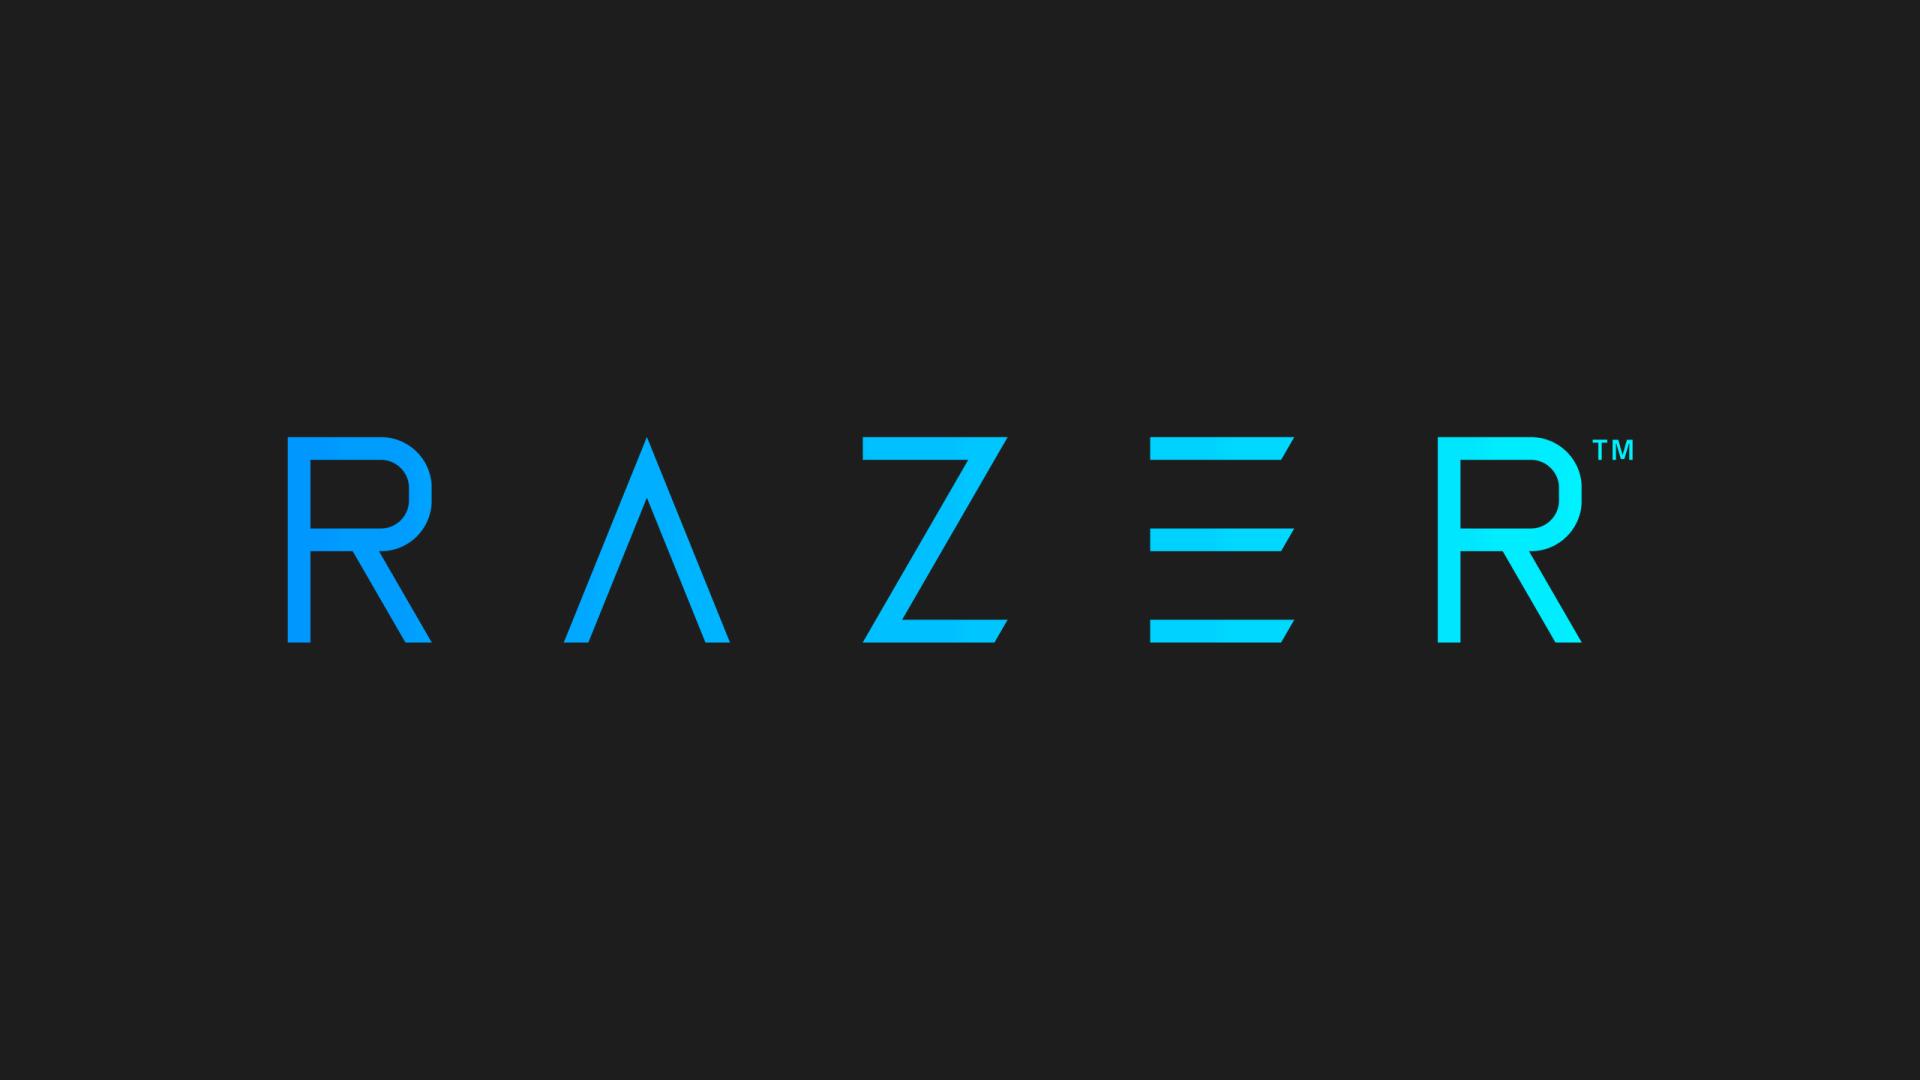 RAZER RGB - V2 - VIDEO - Wallpaper